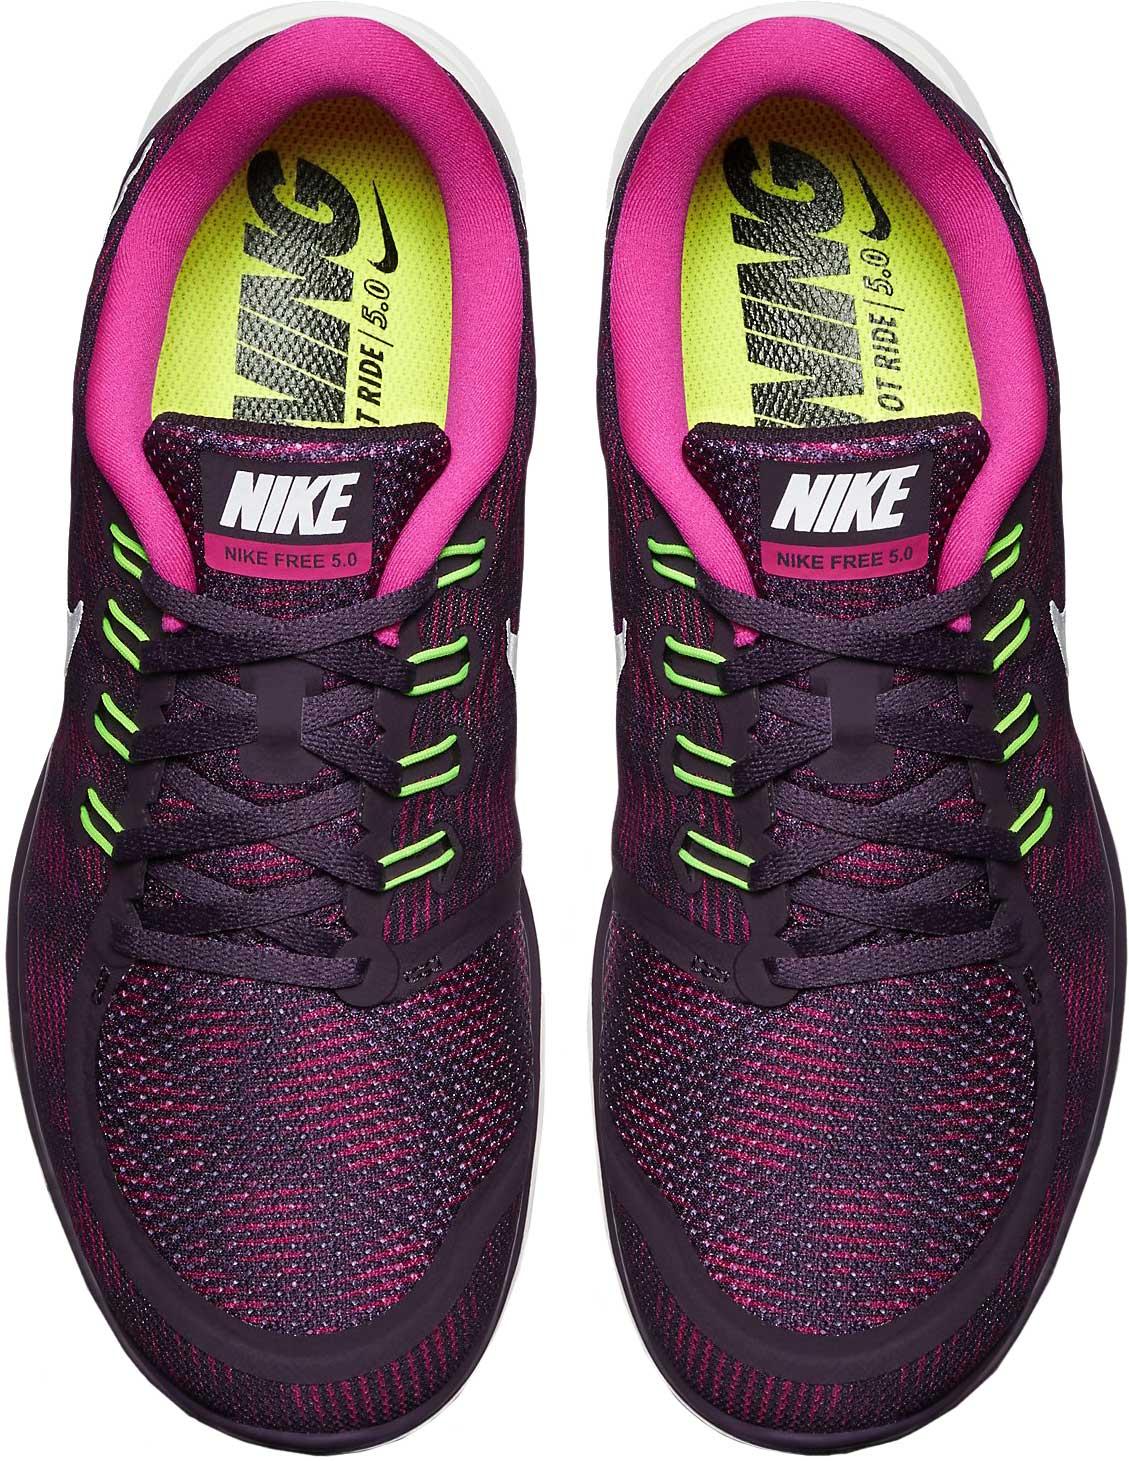 1804acb21eb1 FREE 5.0 PRINT W - Women s Running Shoe